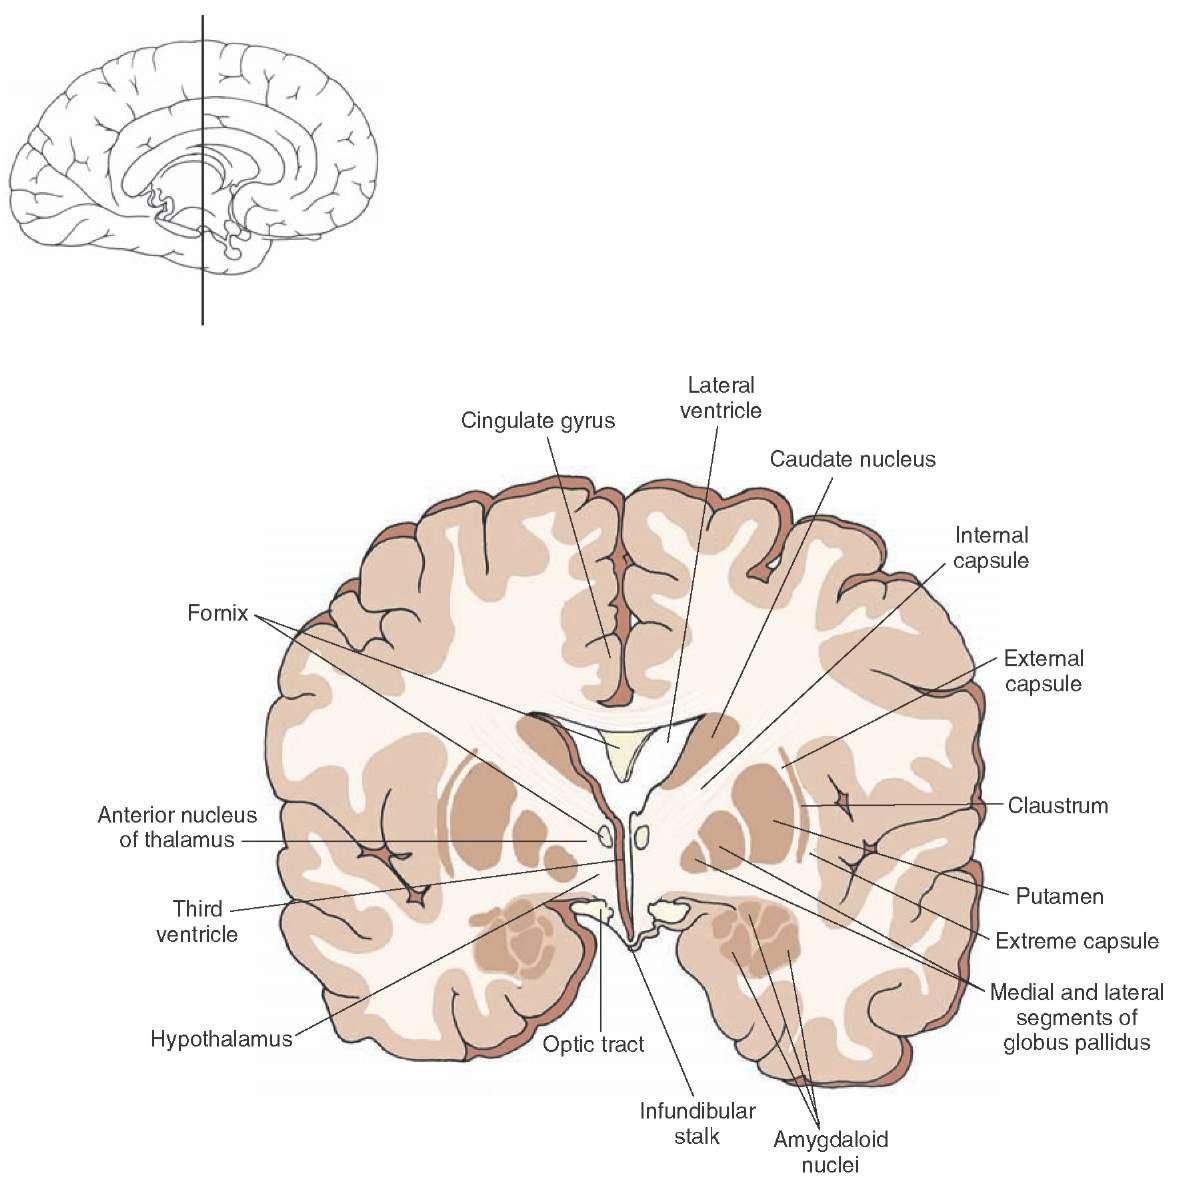 brain diagram thalamus control transformer wiring the forebrain organization of central nervous system